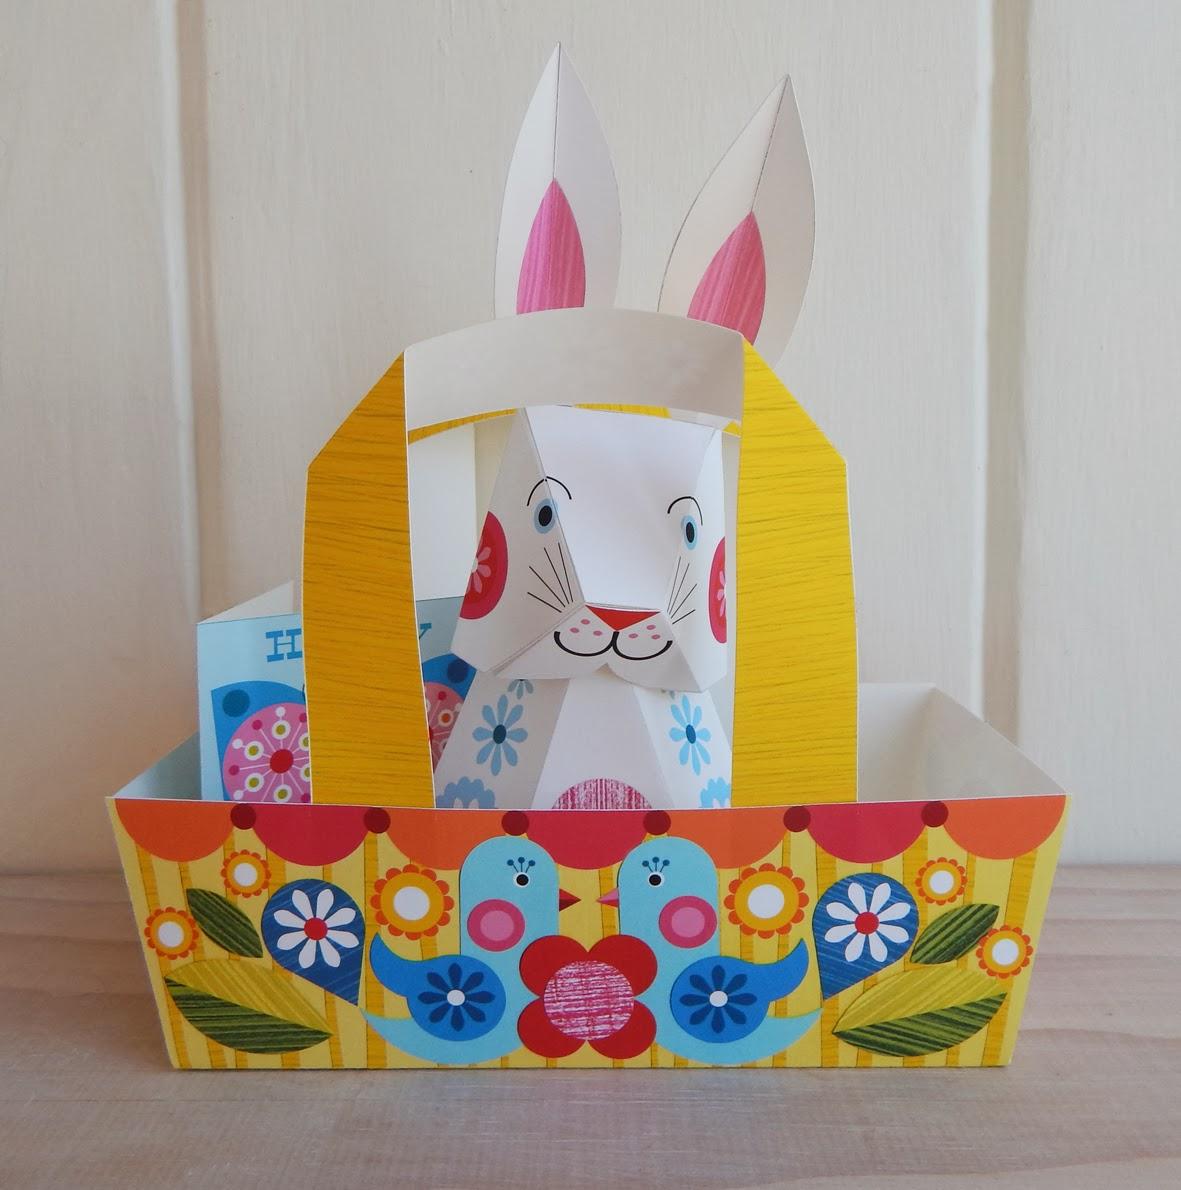 Ellen giggenbach easter decoration paper craft